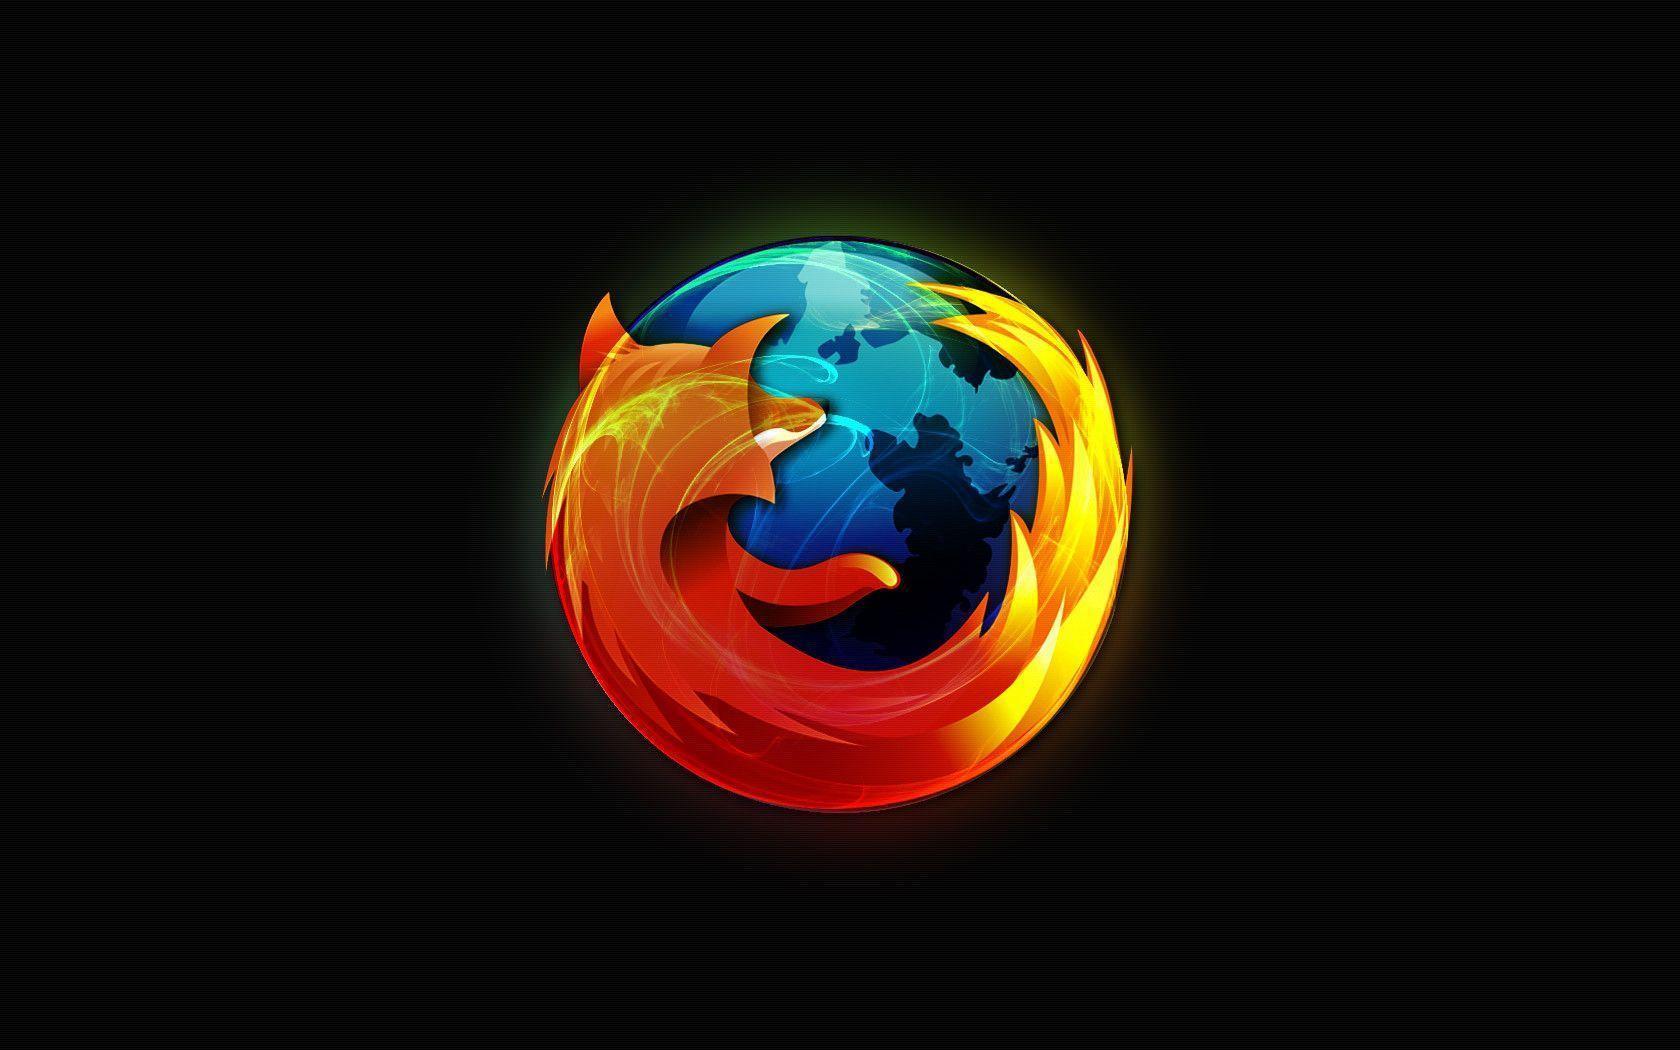 Firefox Backgrounds